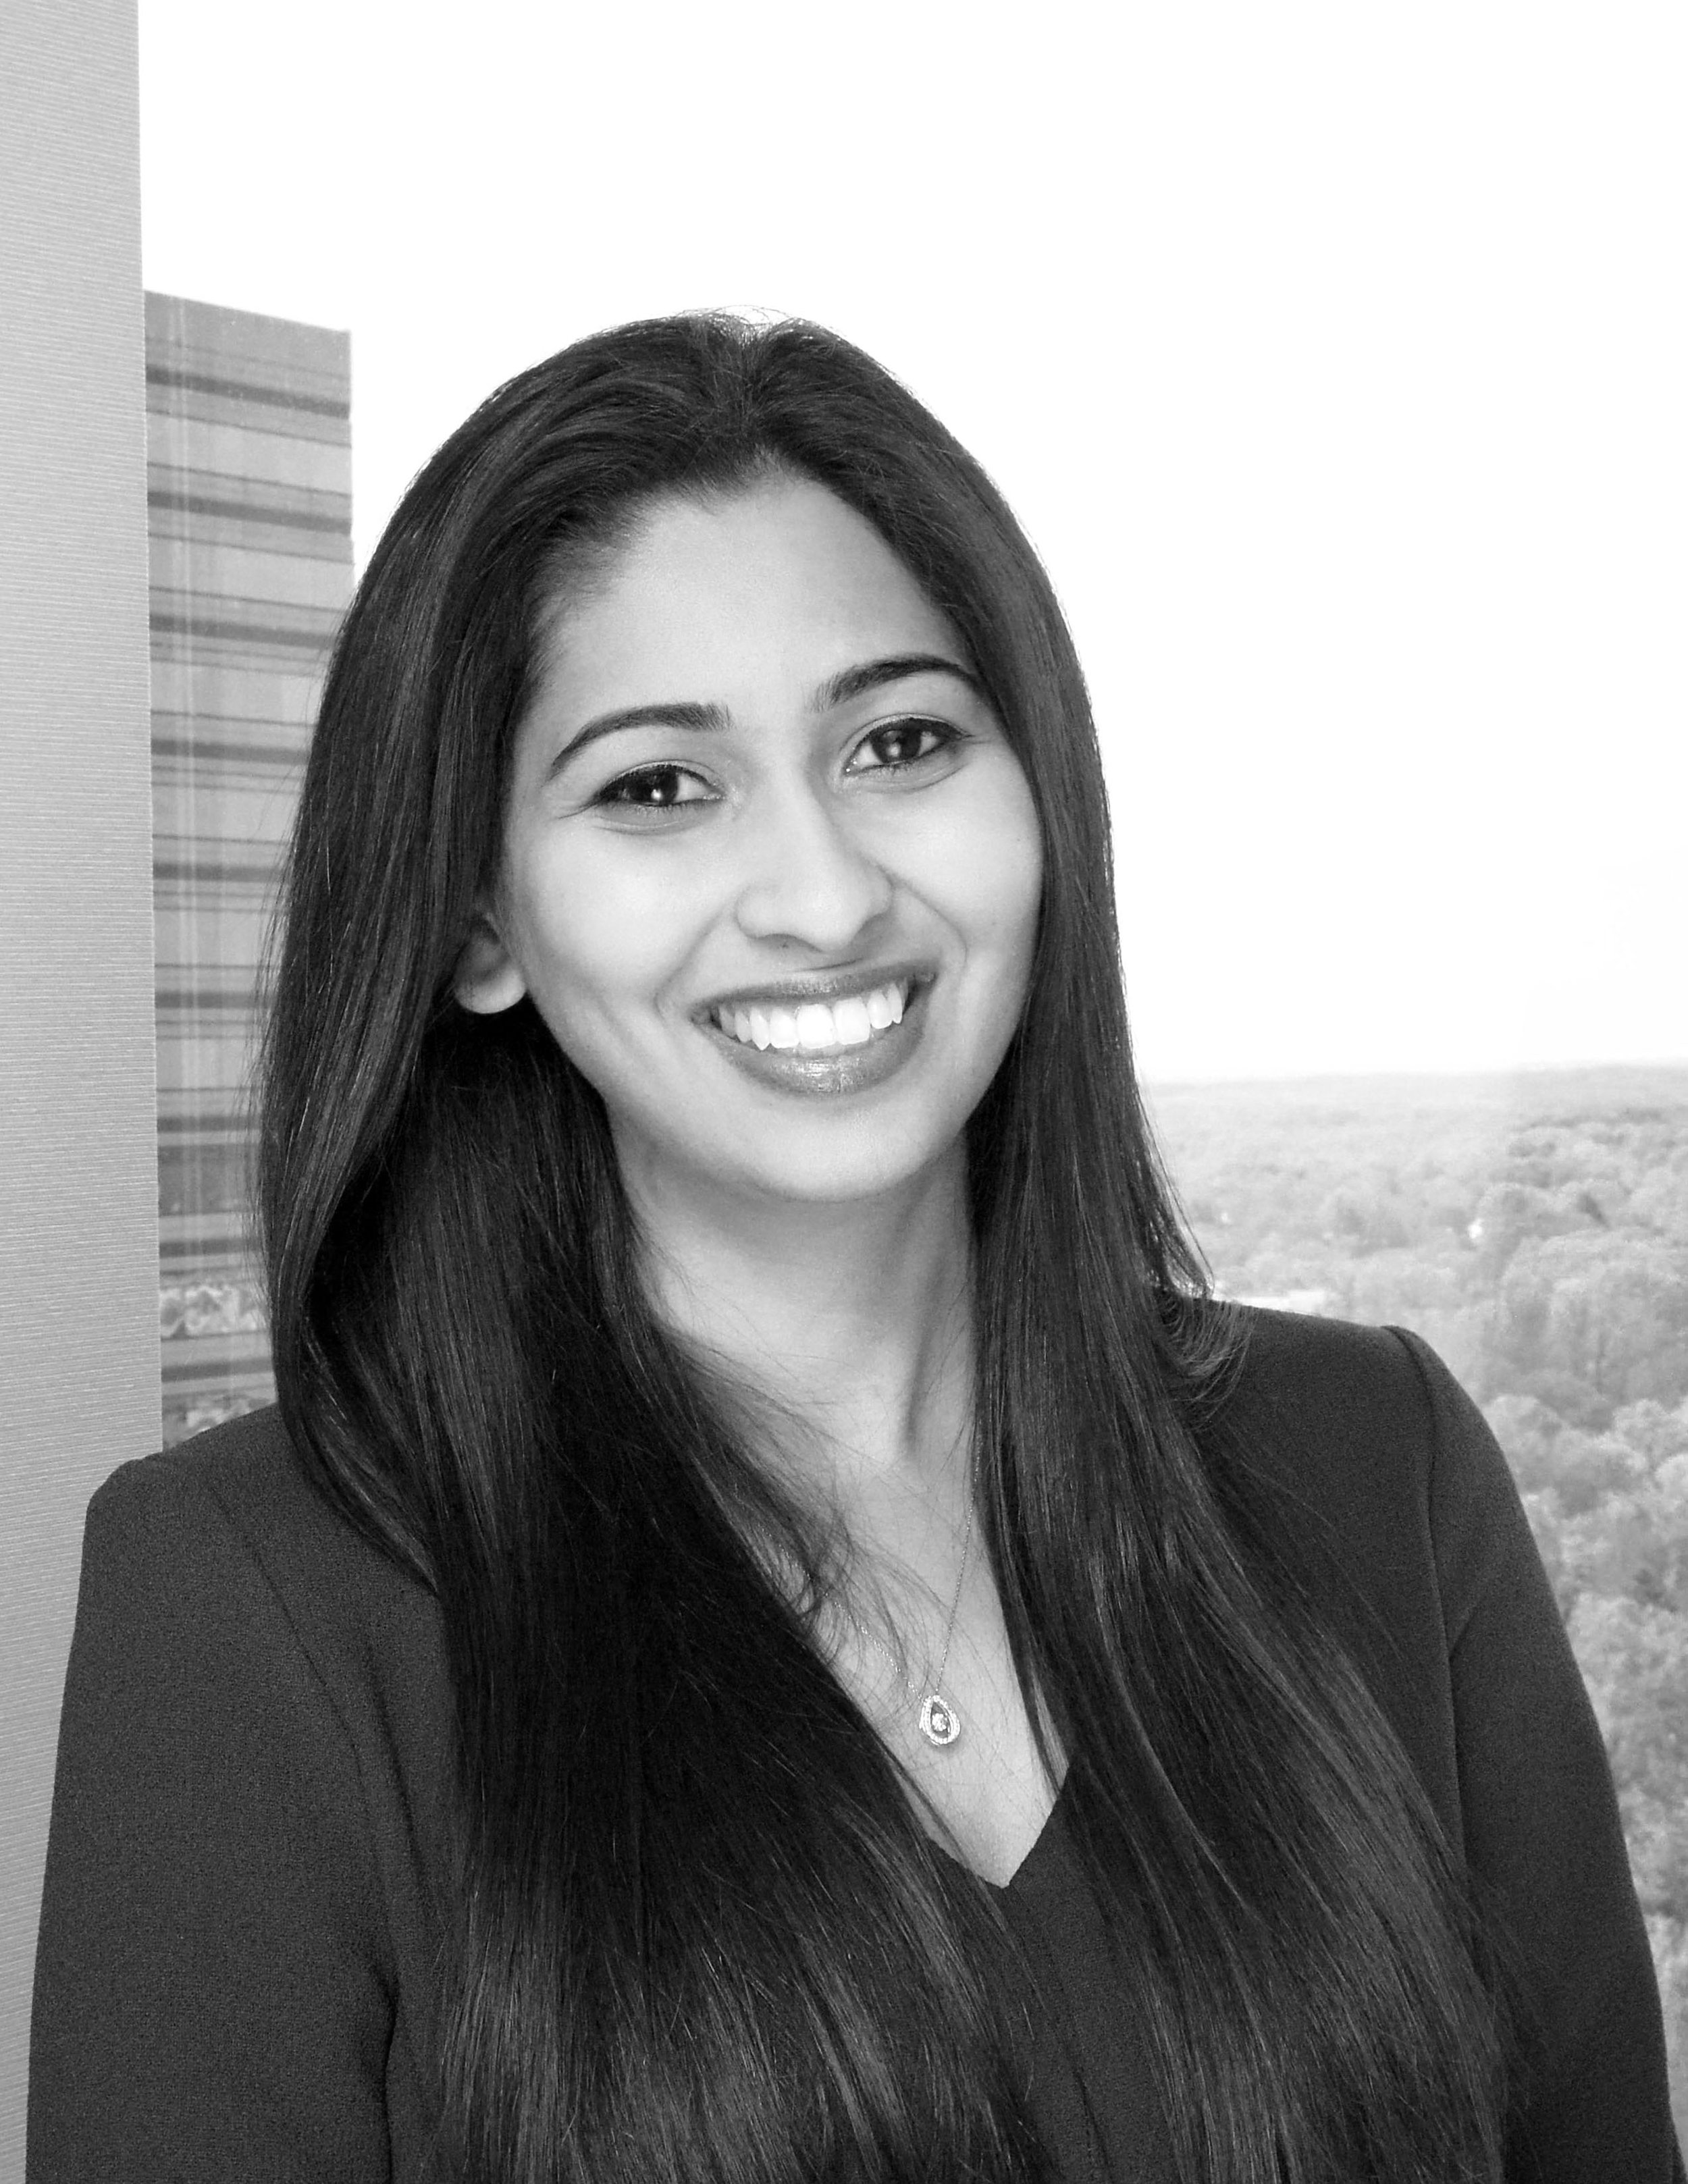 Salma Chaudry Headshot.jpg